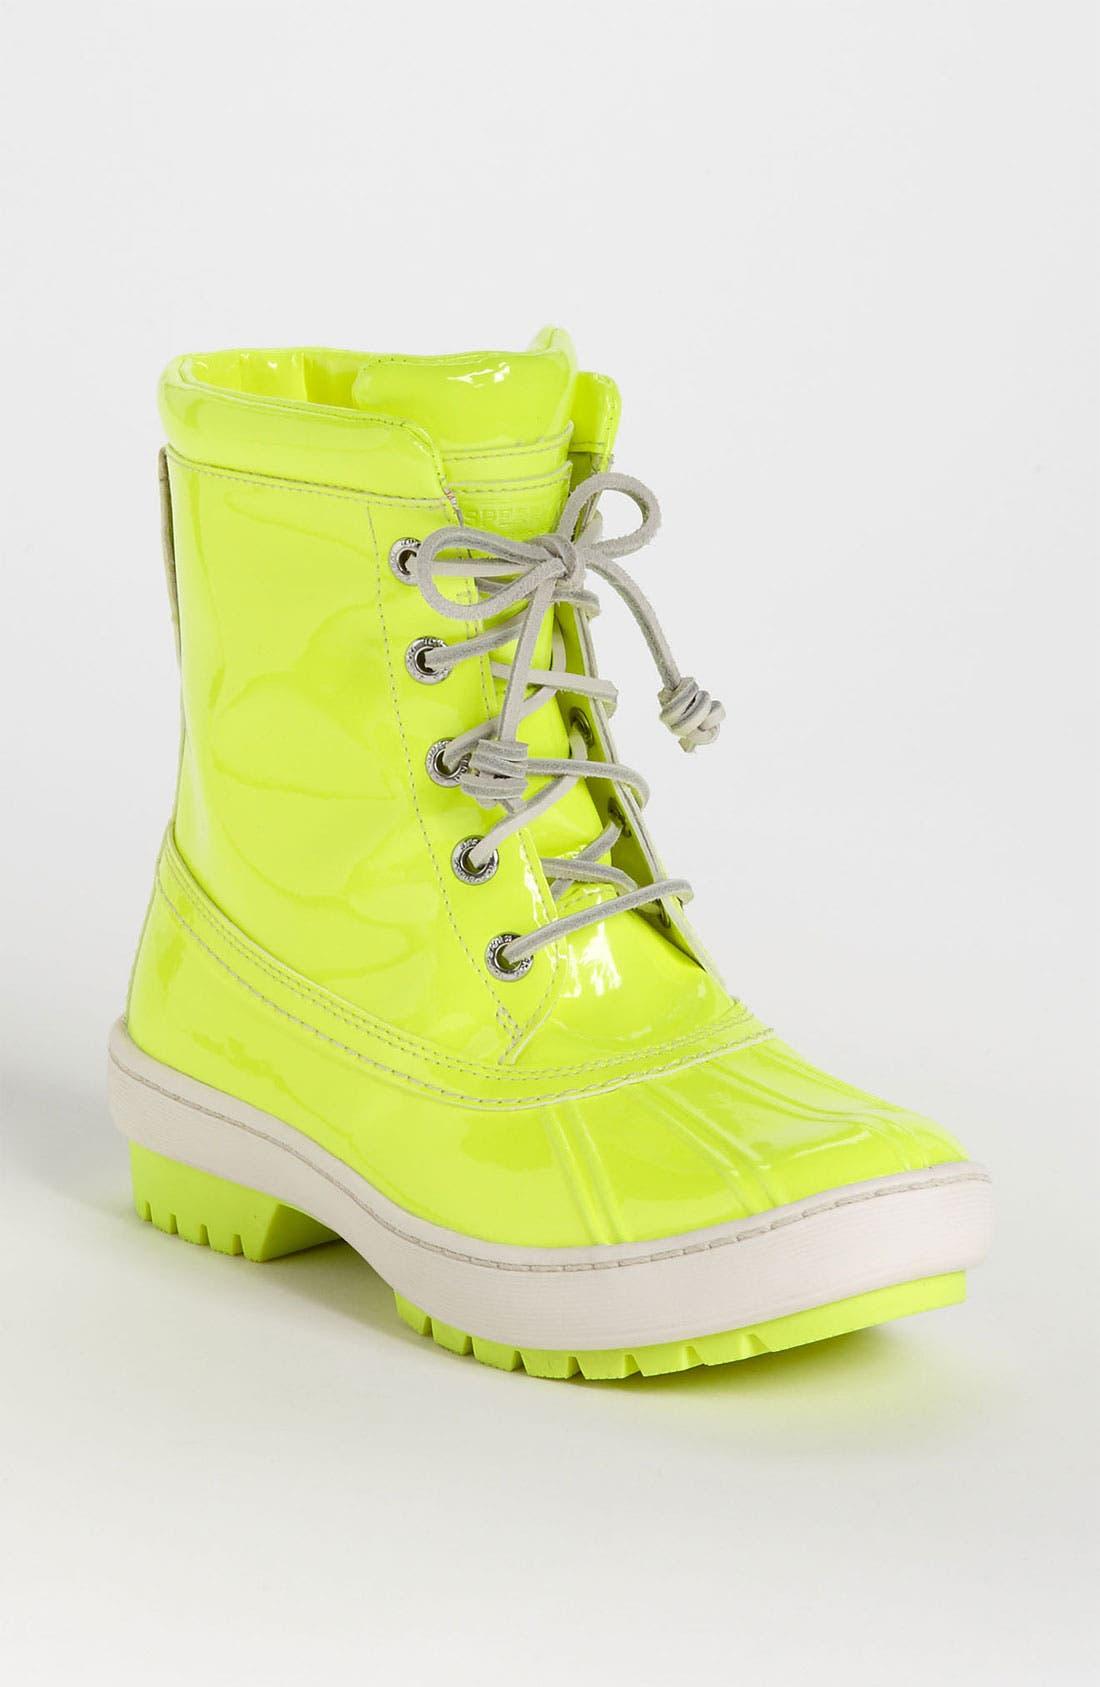 Alternate Image 1 Selected - Sperry Top-Sider® for Jeffrey 'Zermatt' Boot (Online Only)